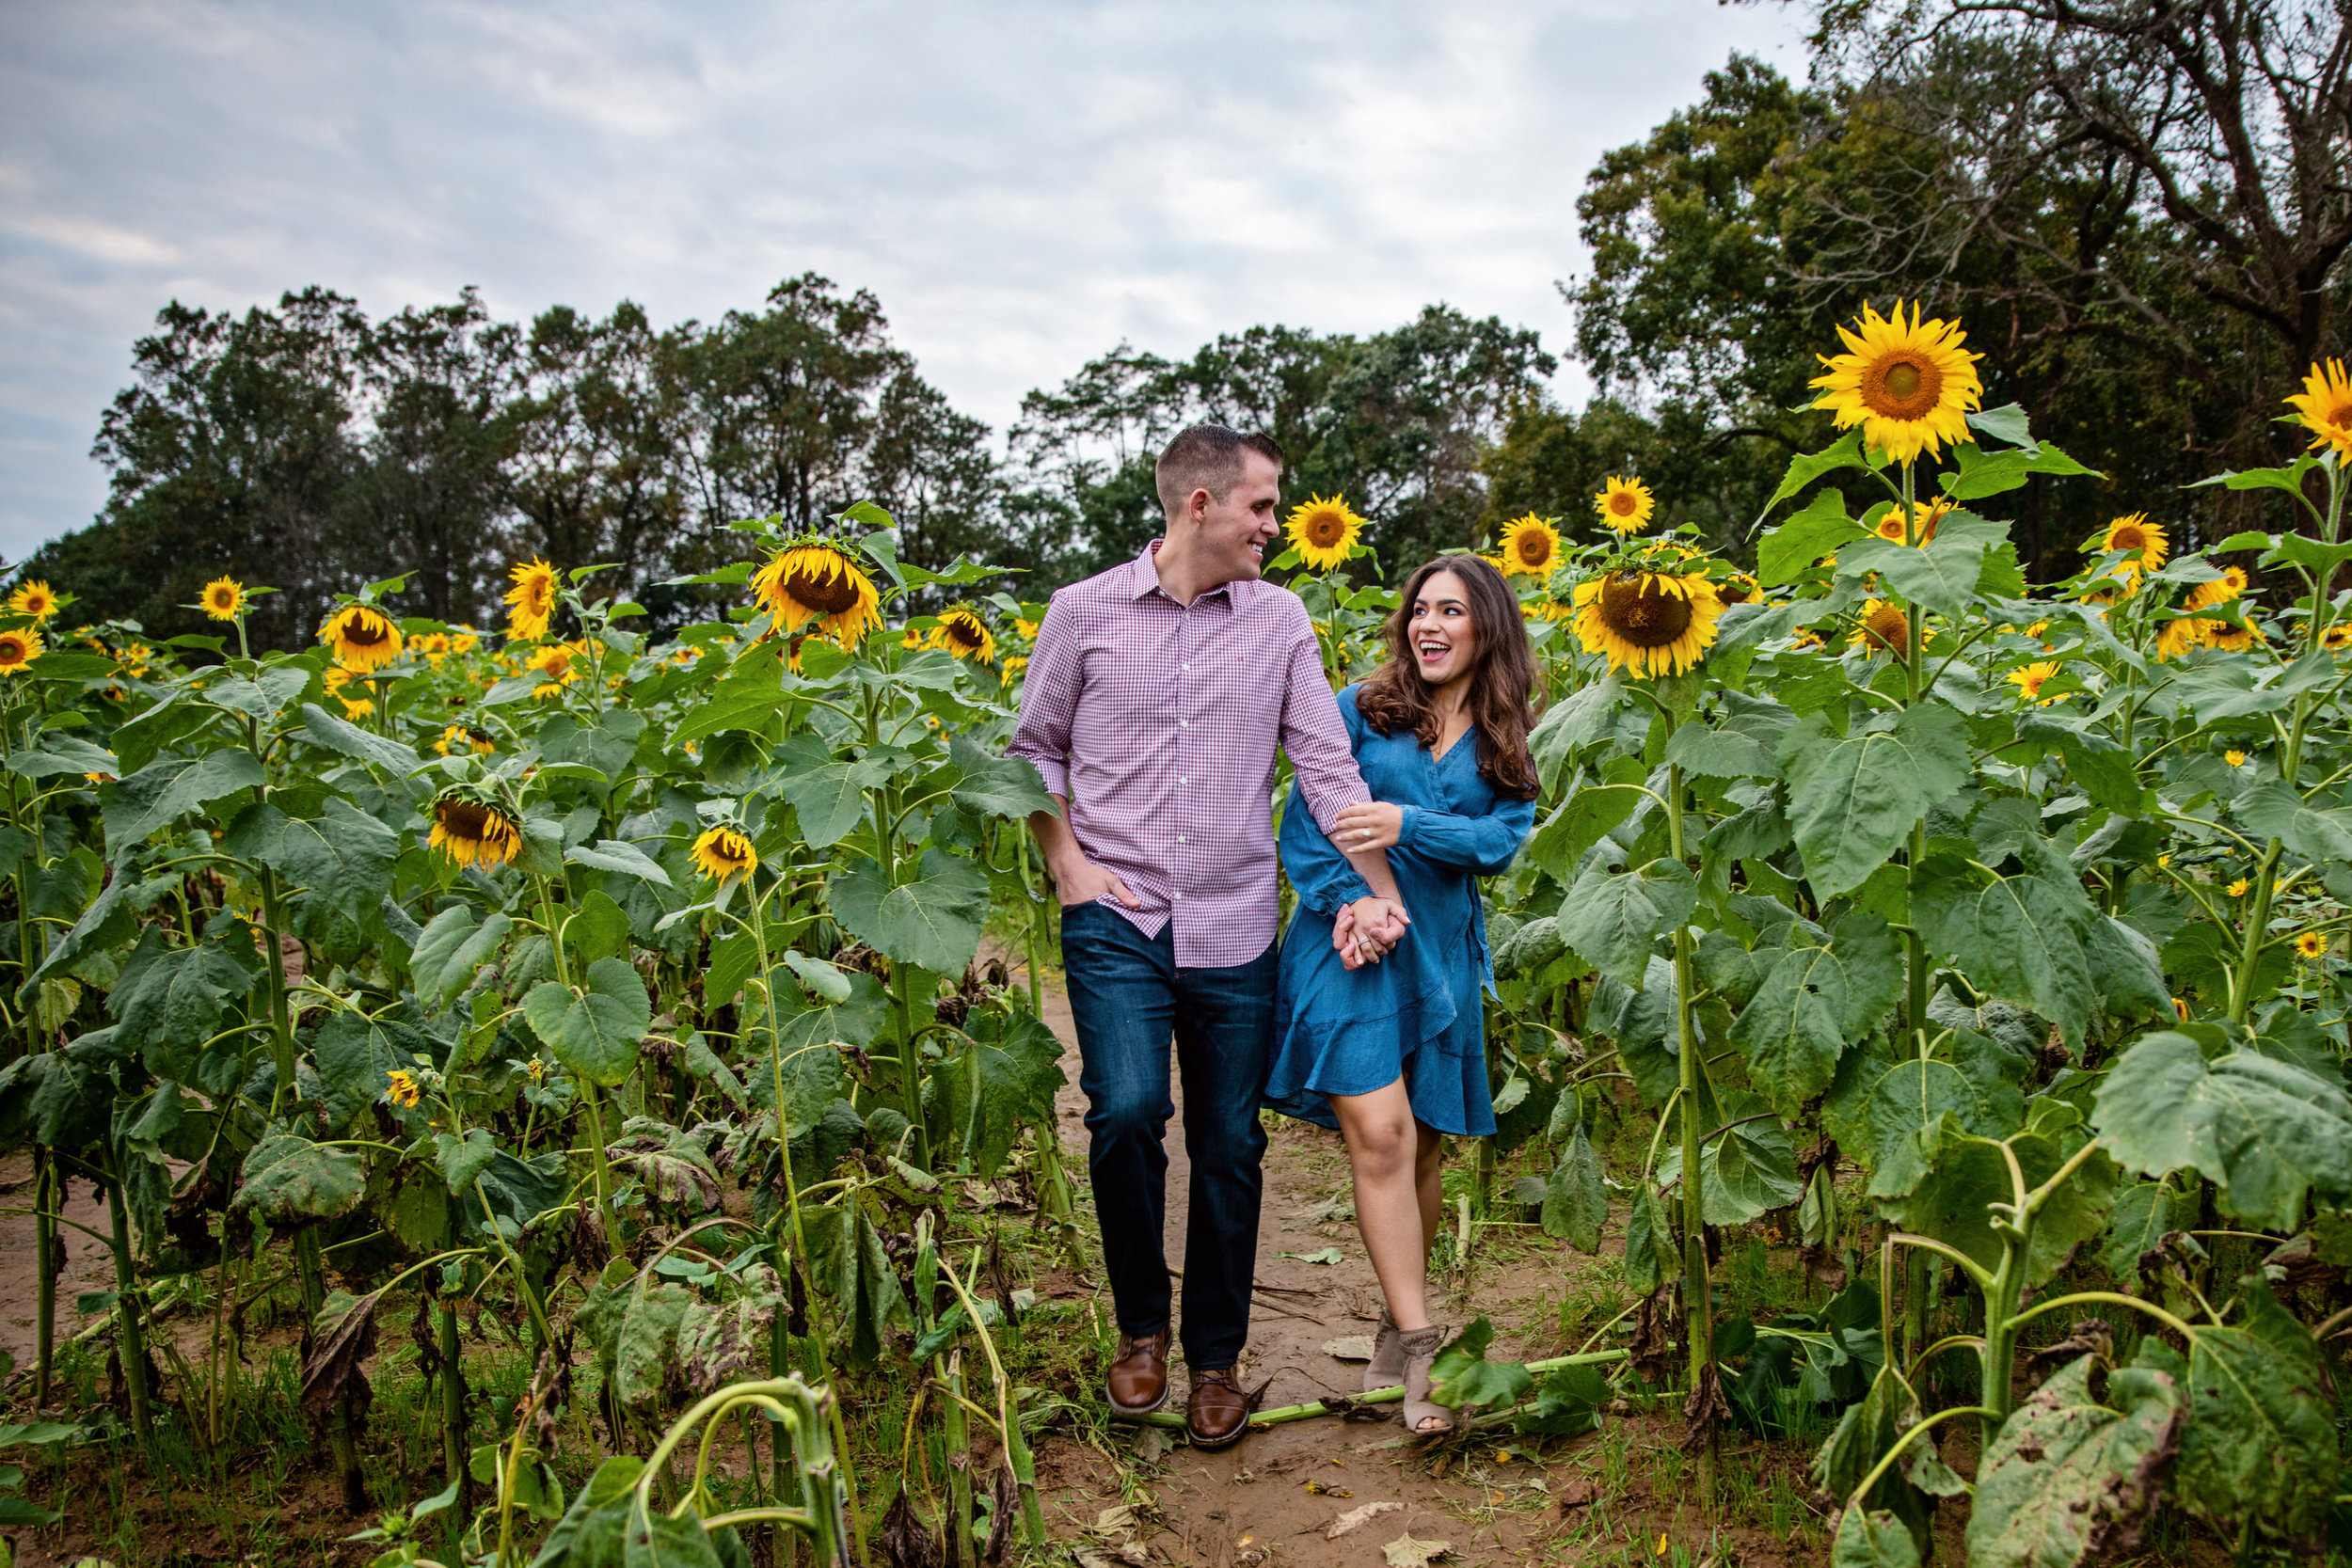 MarylandAdventureEngagement-Brenda&Tony-51.jpg